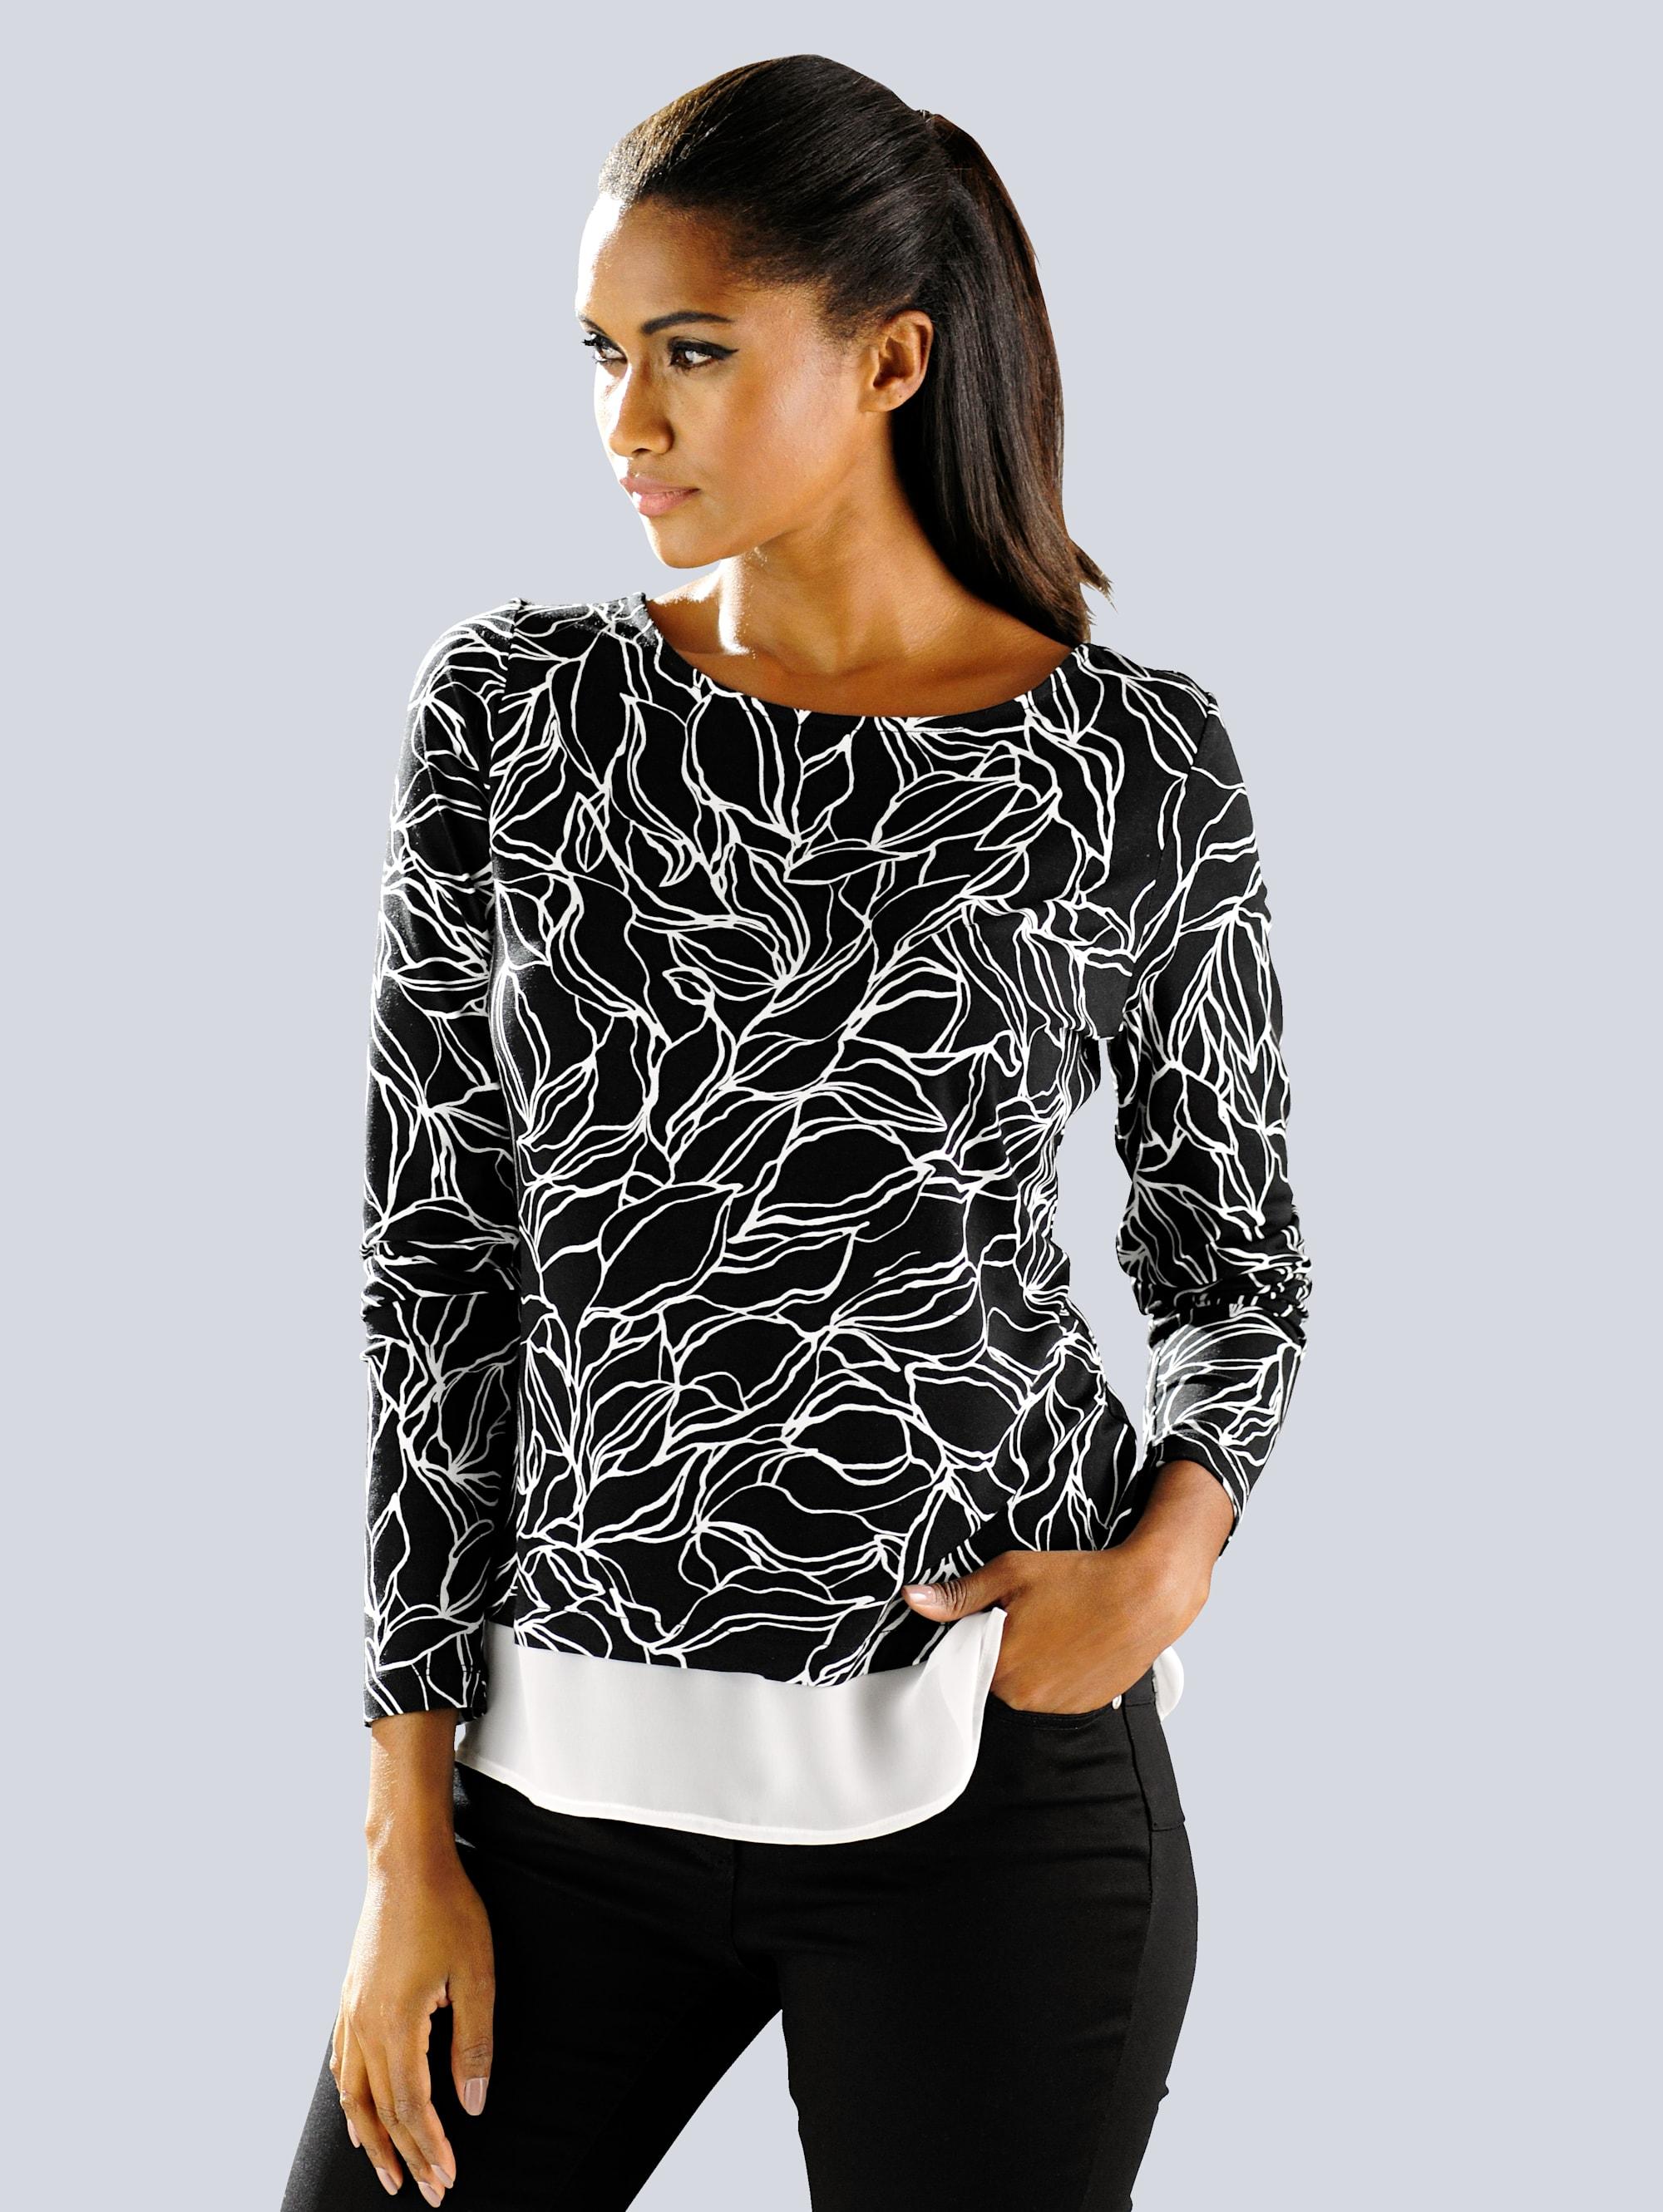 Alba Moda Shirt mit exklusivem Floralprint Omdul lM8zv